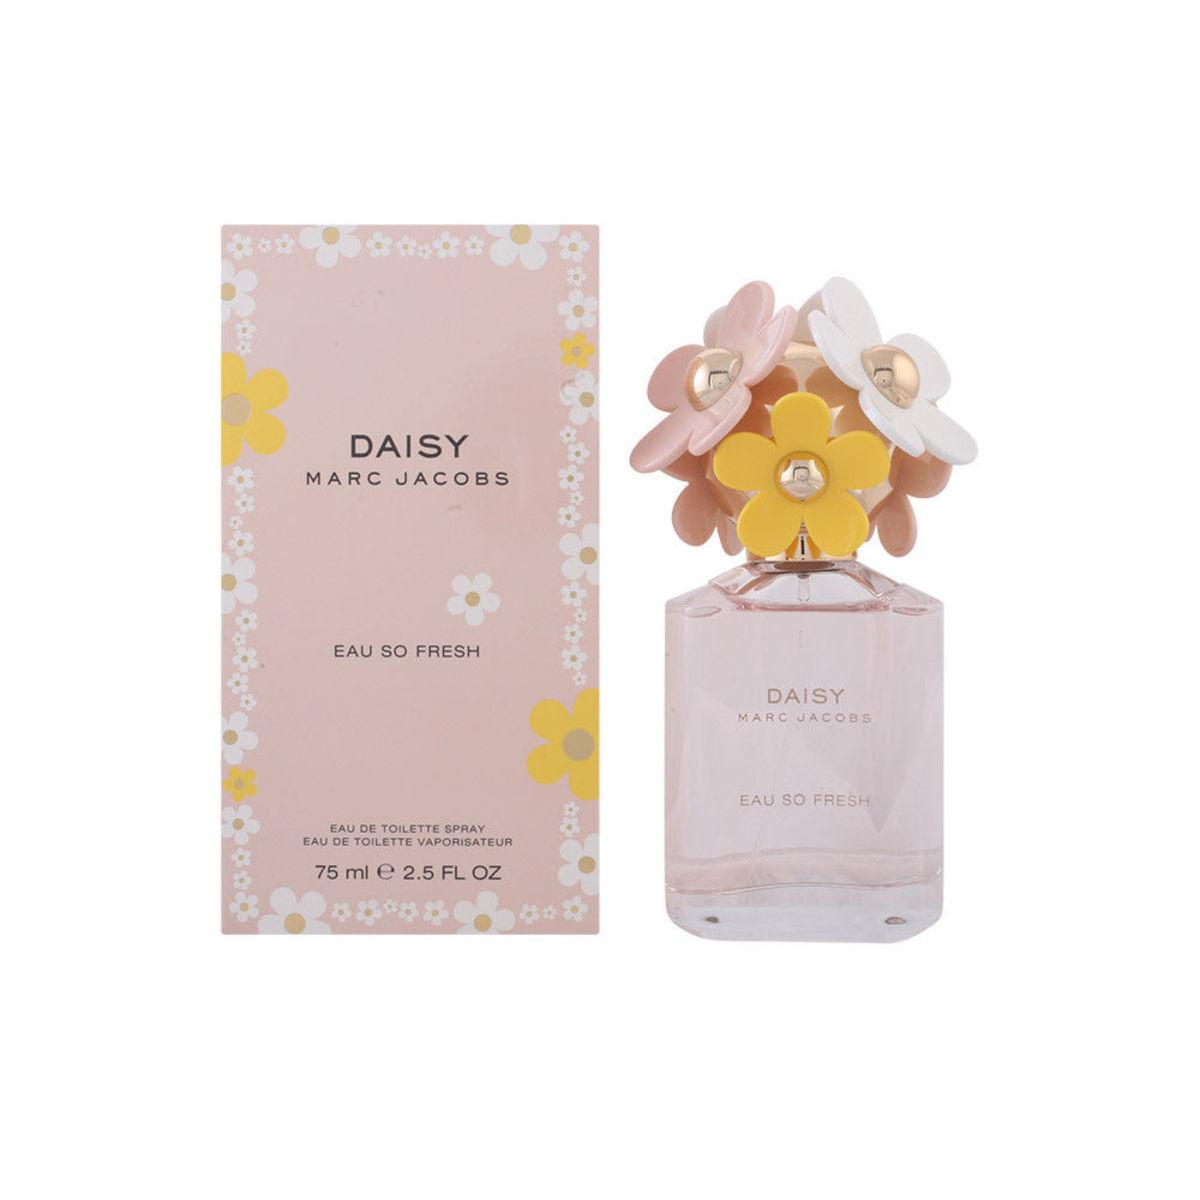 Daisy Eau So Fresh EDT 75ml [Parallel Import]